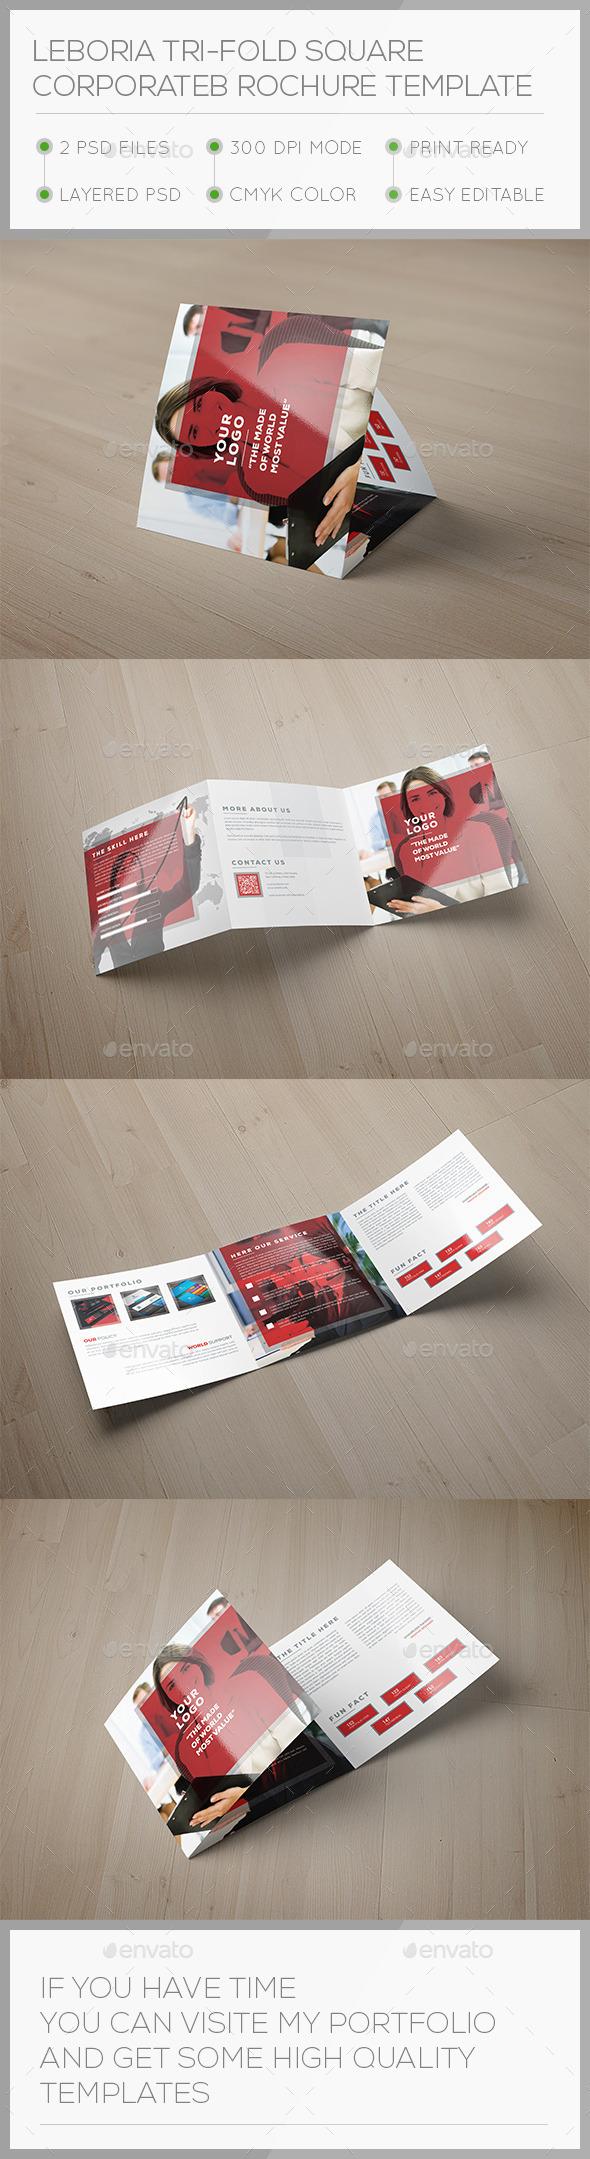 Leboria Tri-fold Square Brochure Template - Corporate Brochures